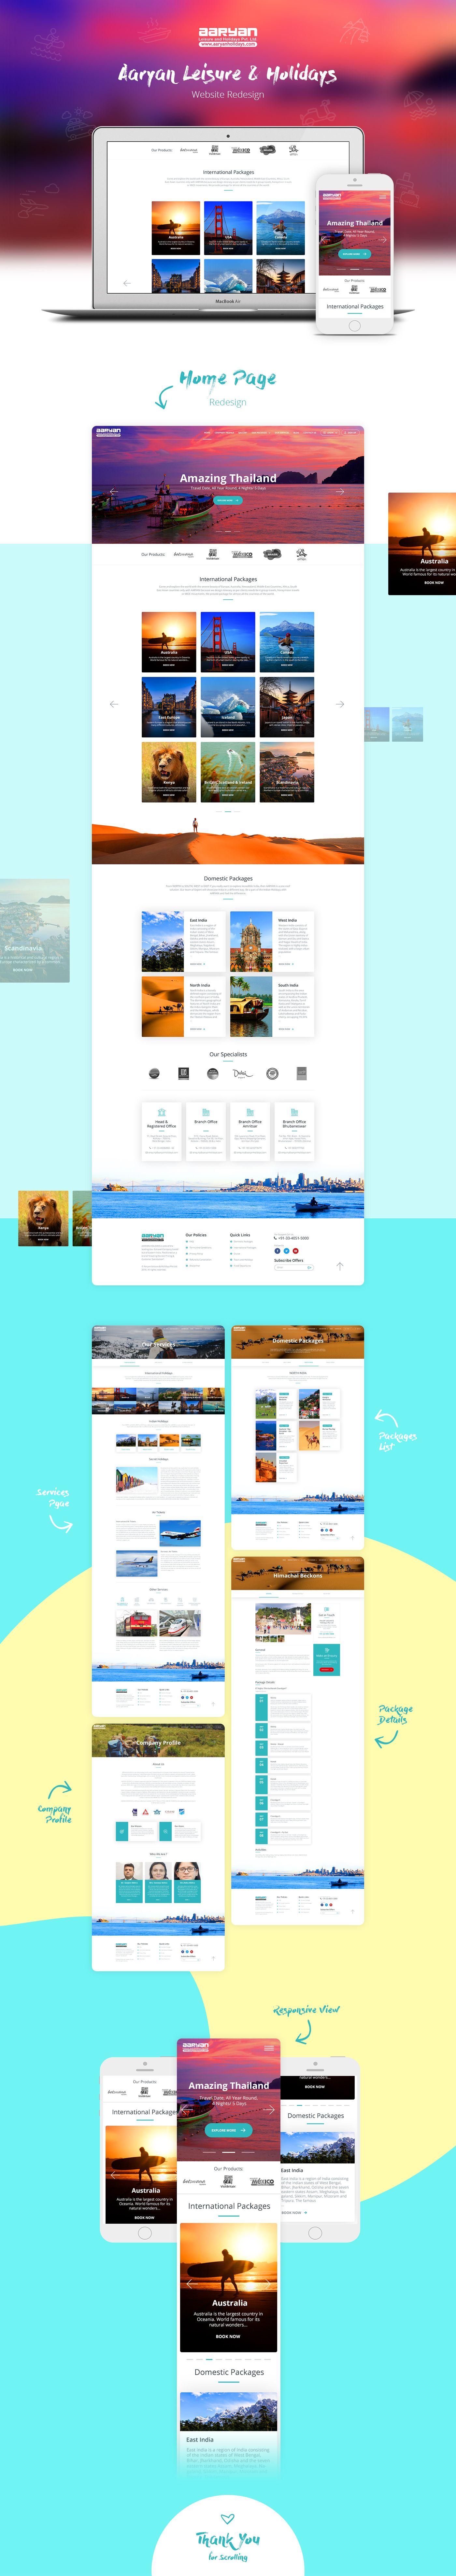 Aaryan Leisure Holiday Website Redesign Modern Website Design